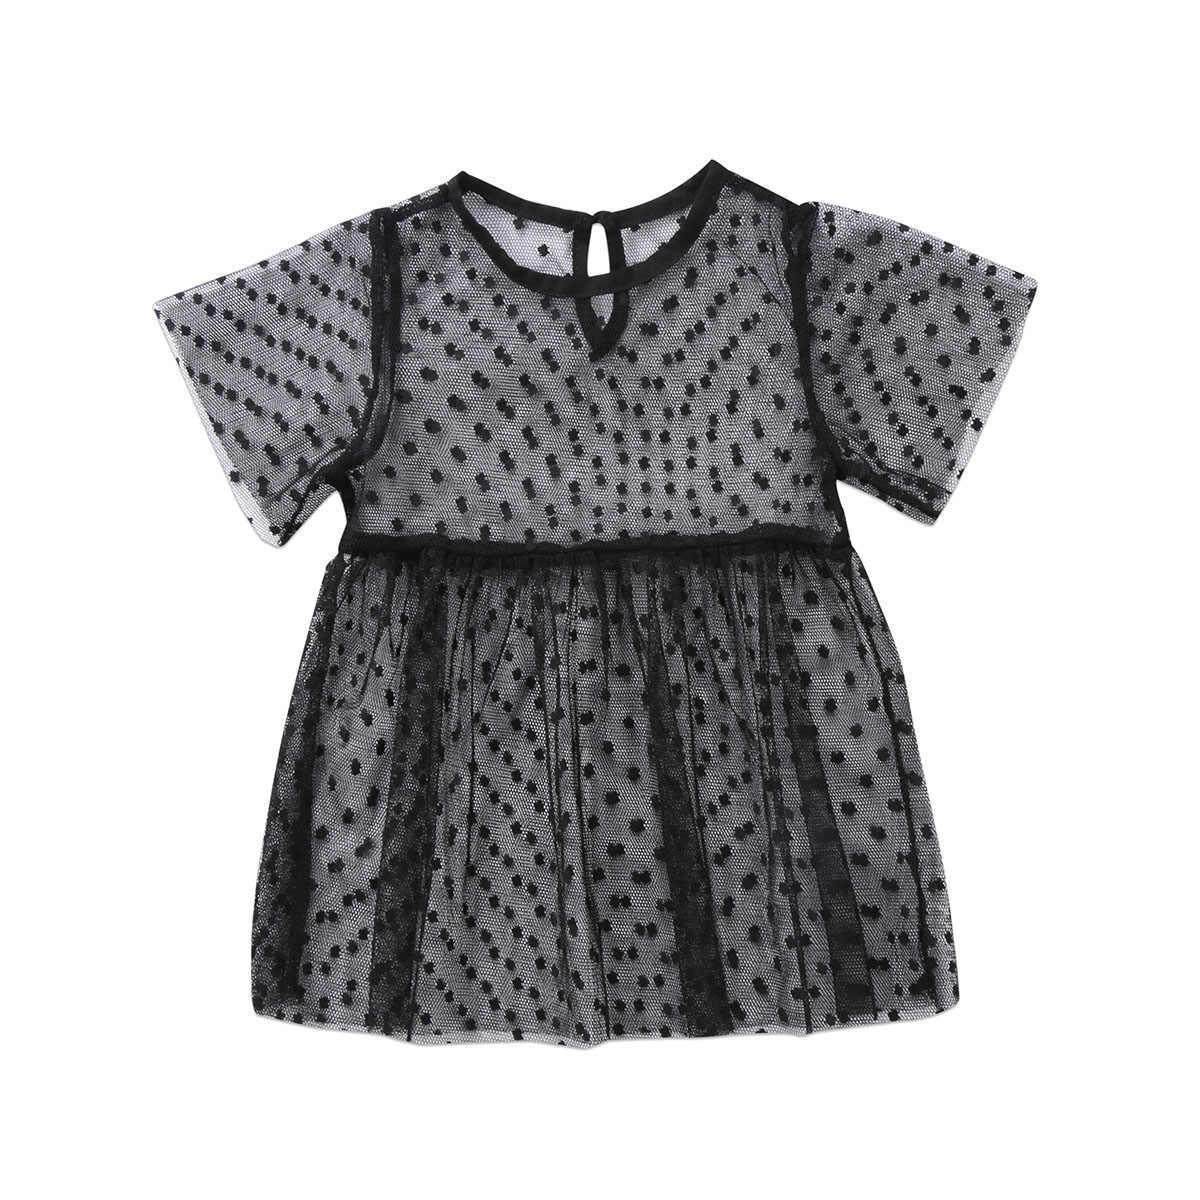 Pudcoco נסיכת בנות בנות תינוק תינוקת פעוט שמלת טול שקוף 6M-5Years אבזרי תמונה בגדי המפלגה תחרות בנות